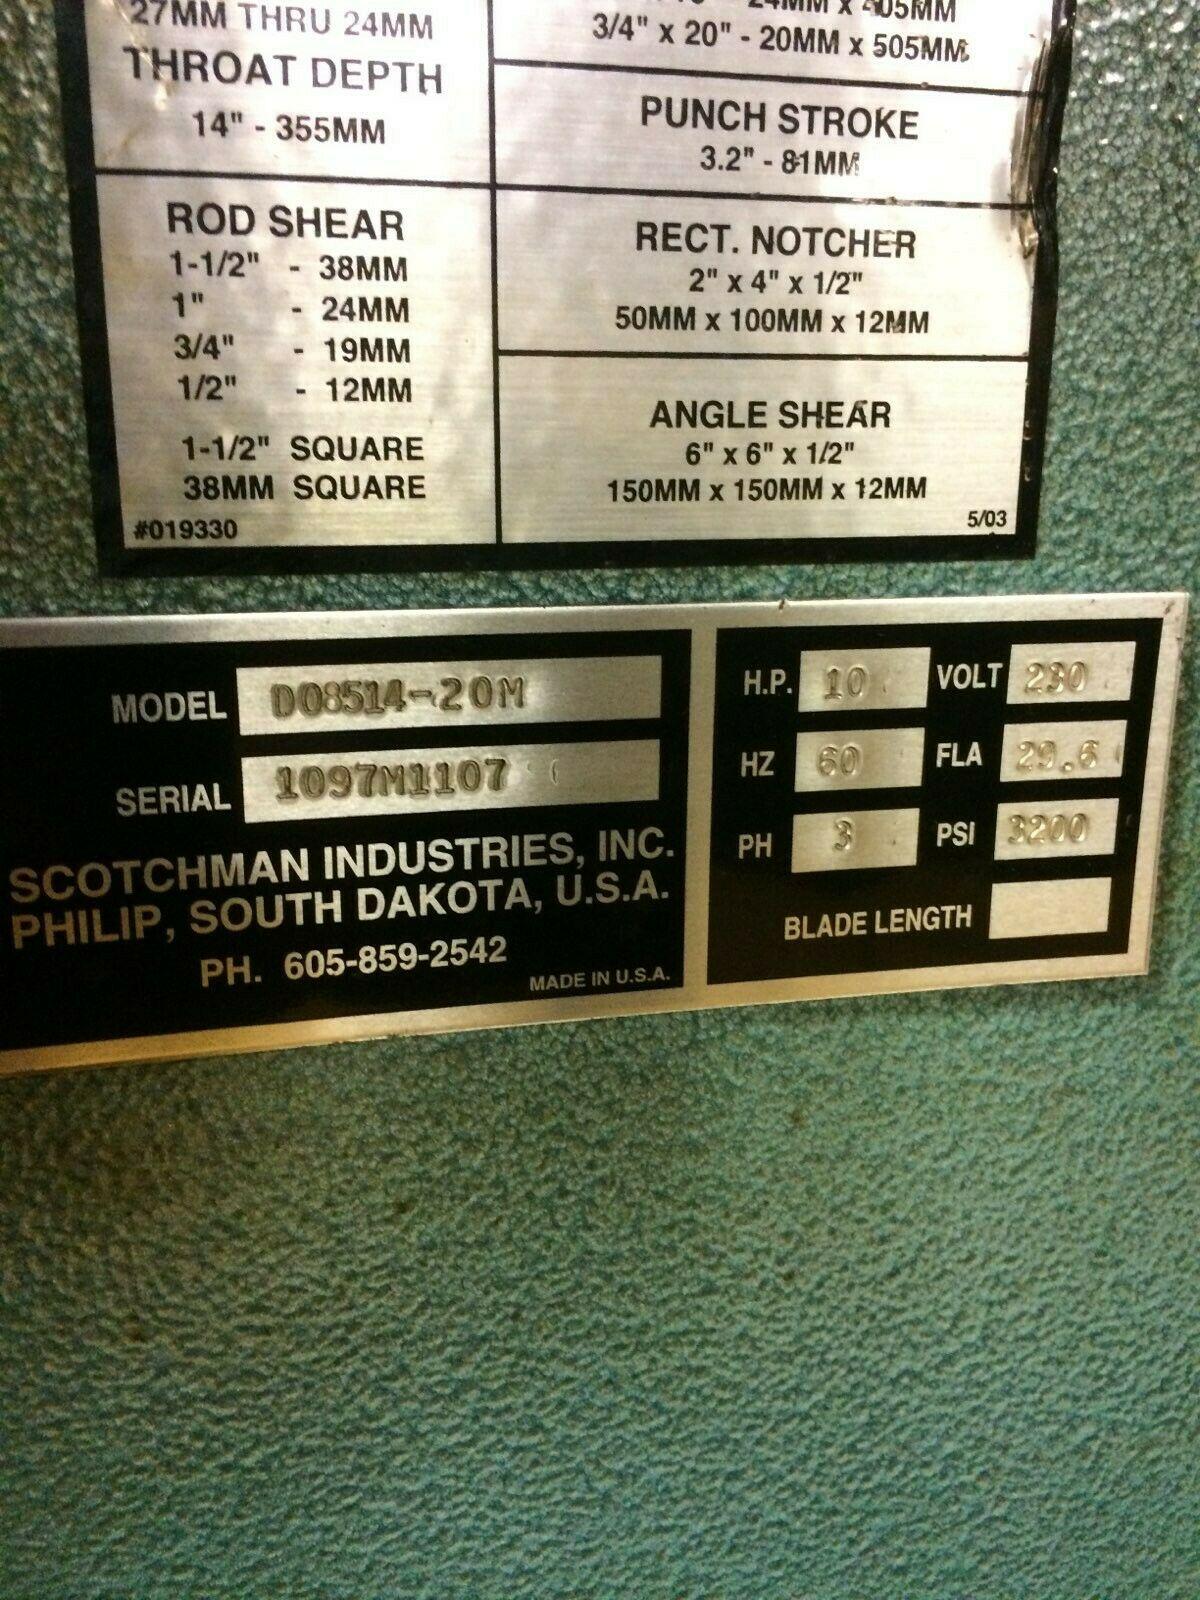 "Scotchman DO8514-20M Dual Operated 85 Ton Iron Worker 14"" Throat"